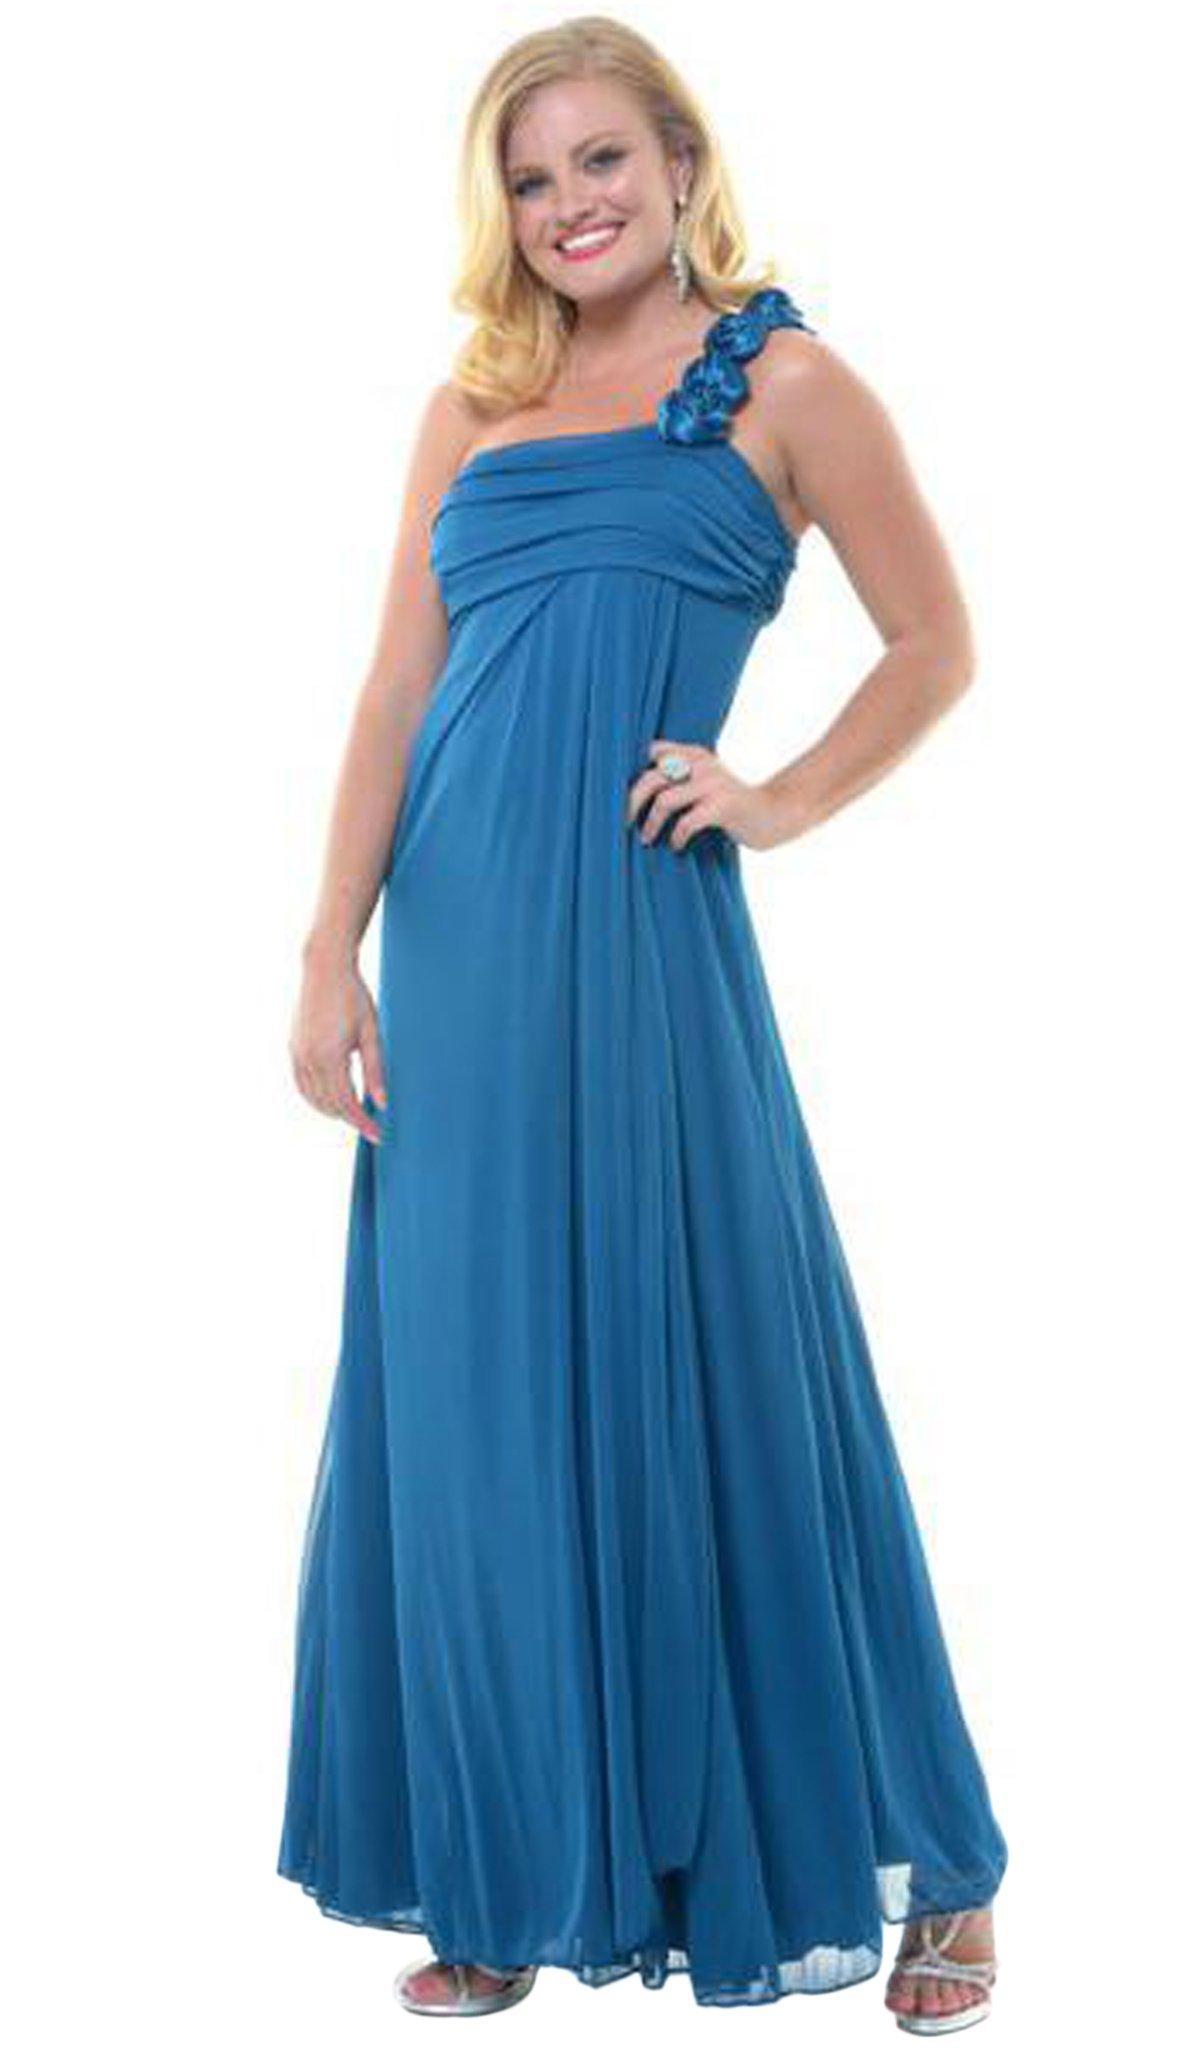 Eureka Fashion - 1701 Rosette Strap One Shoulder Empire Waist Gown